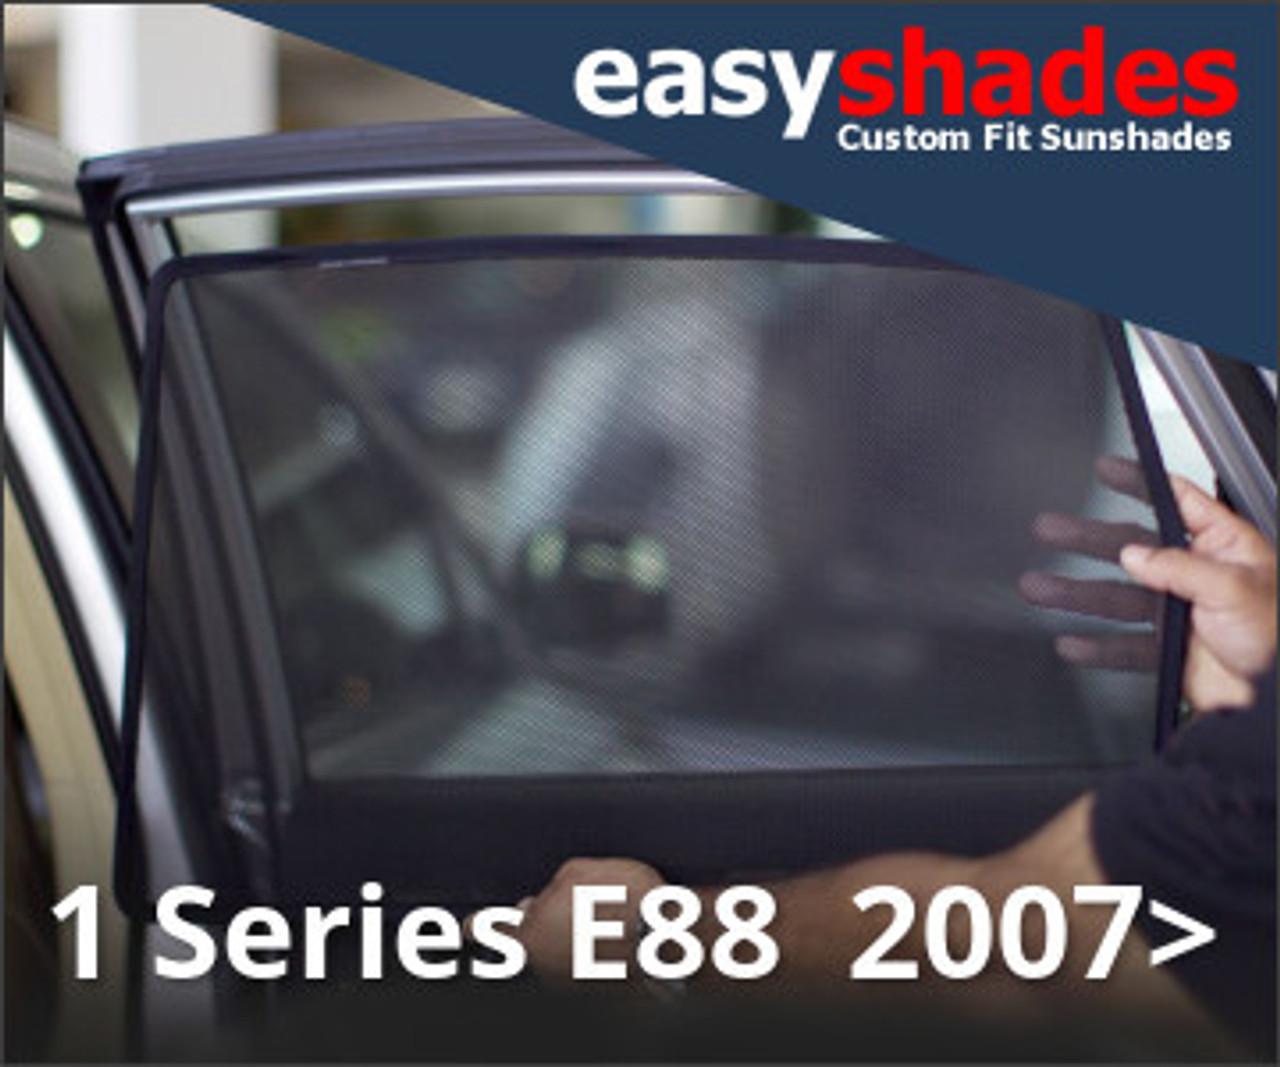 E88 2007>